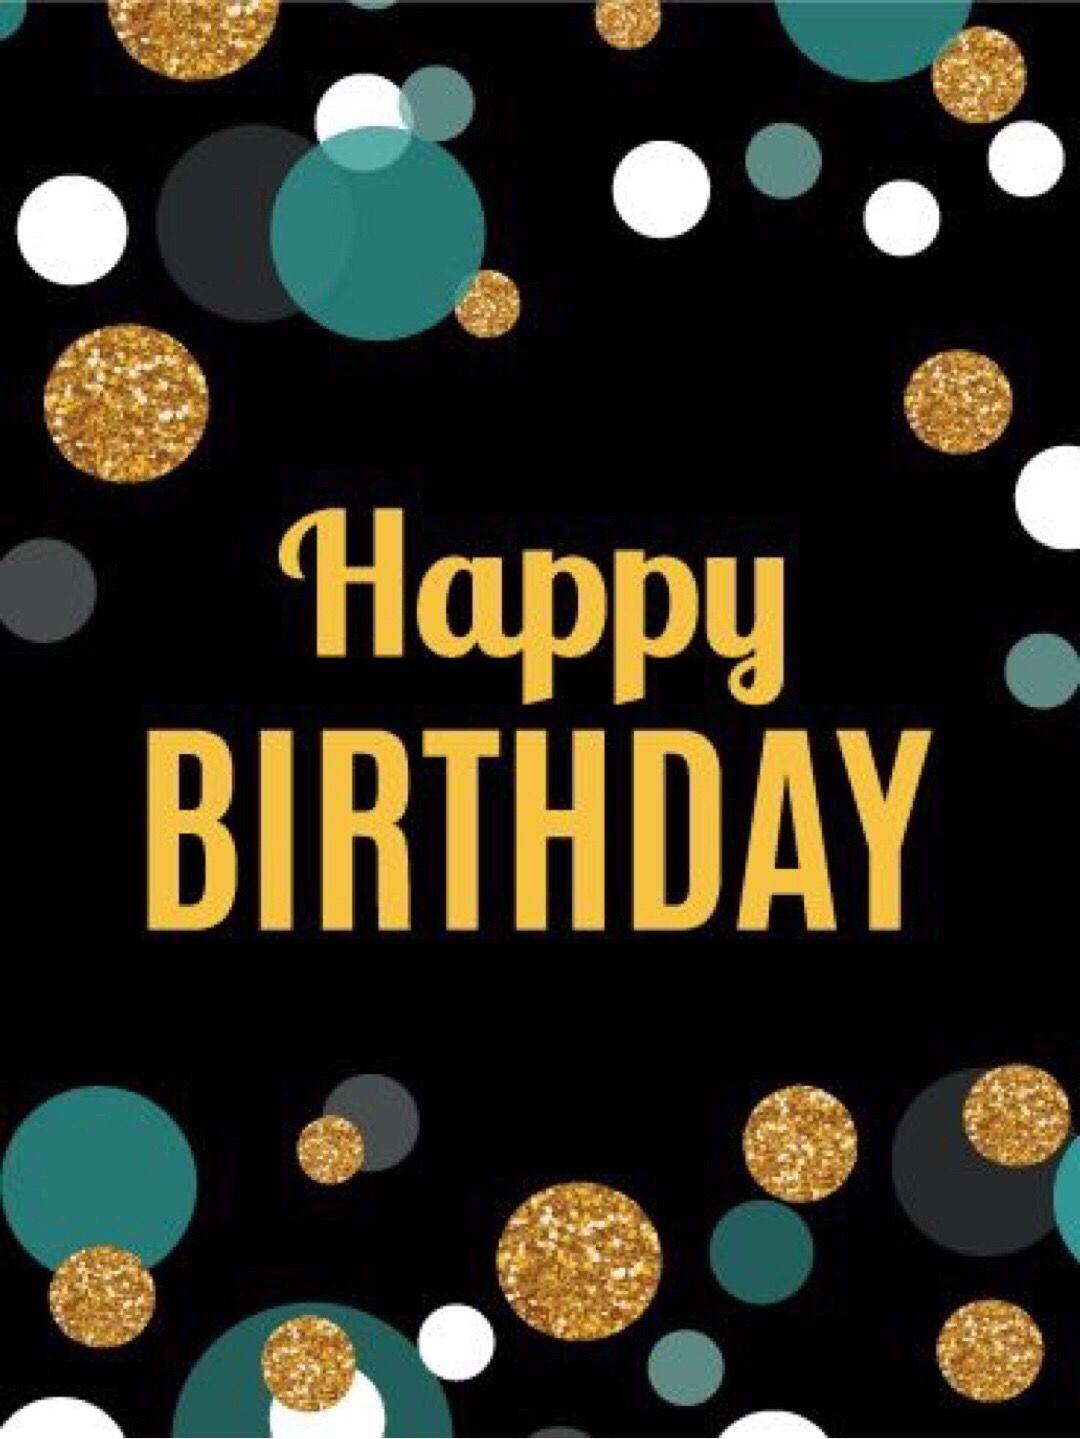 Birthday polka dots (With images) Happy birthday man